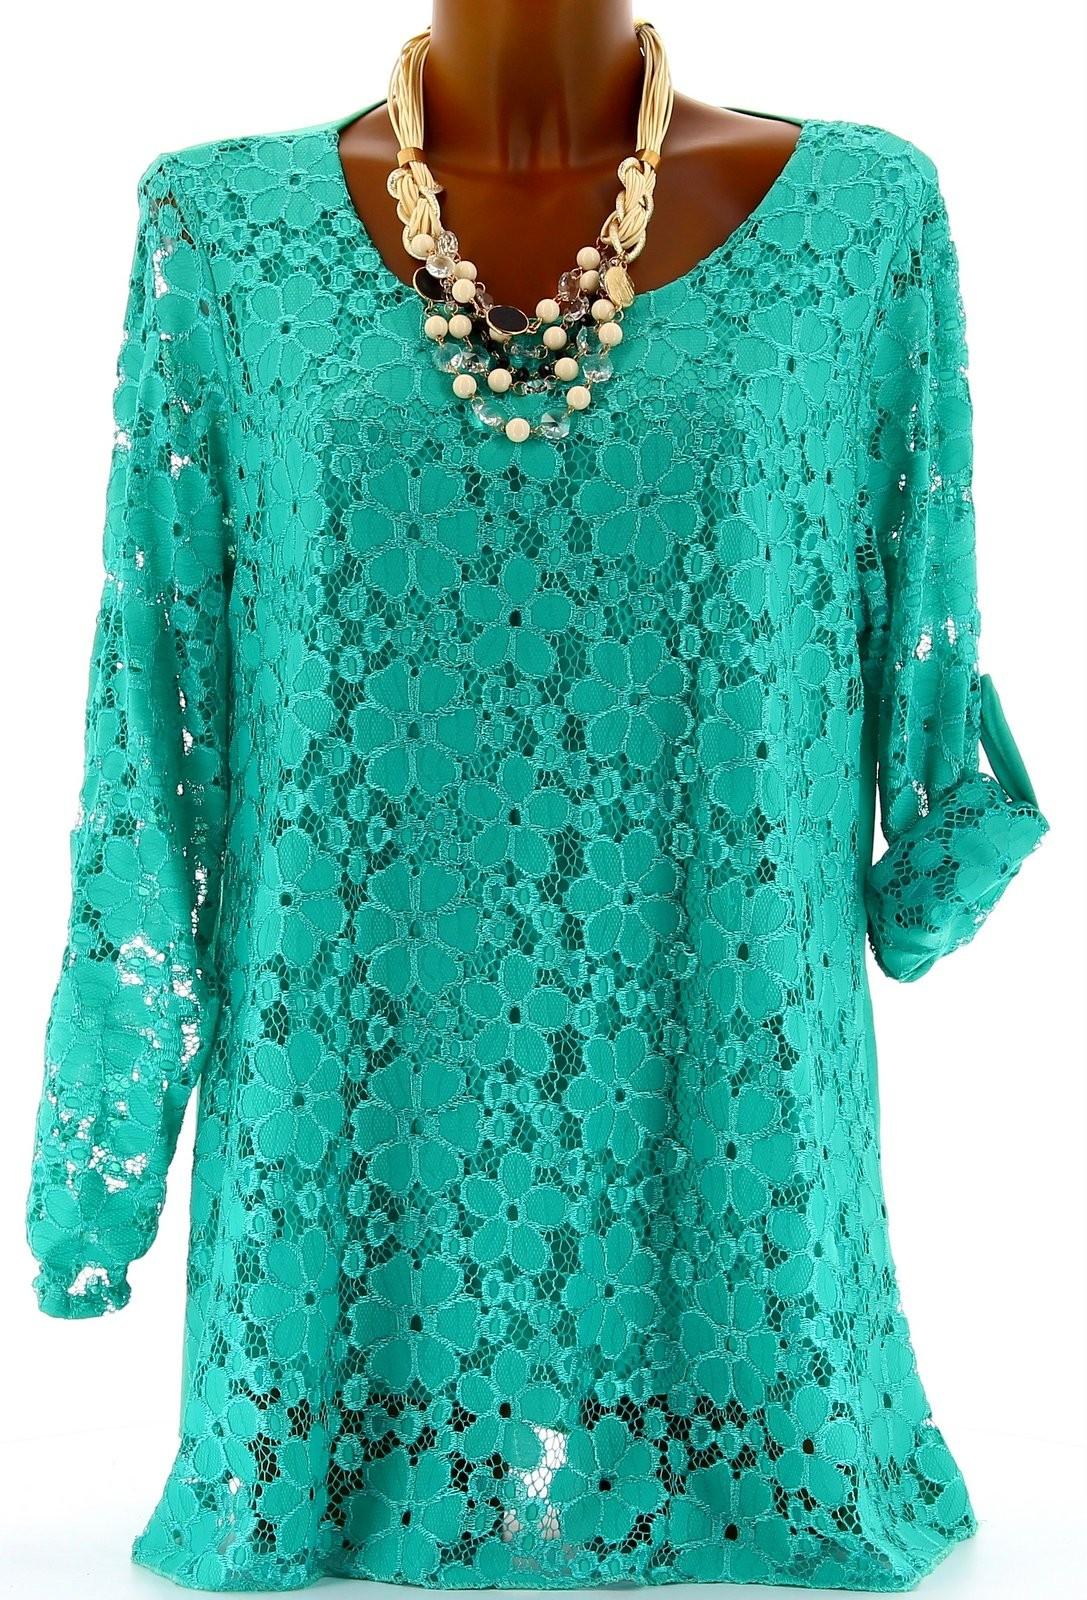 tunique chemise dentelle 40 48 boh me haut top maryse vert. Black Bedroom Furniture Sets. Home Design Ideas